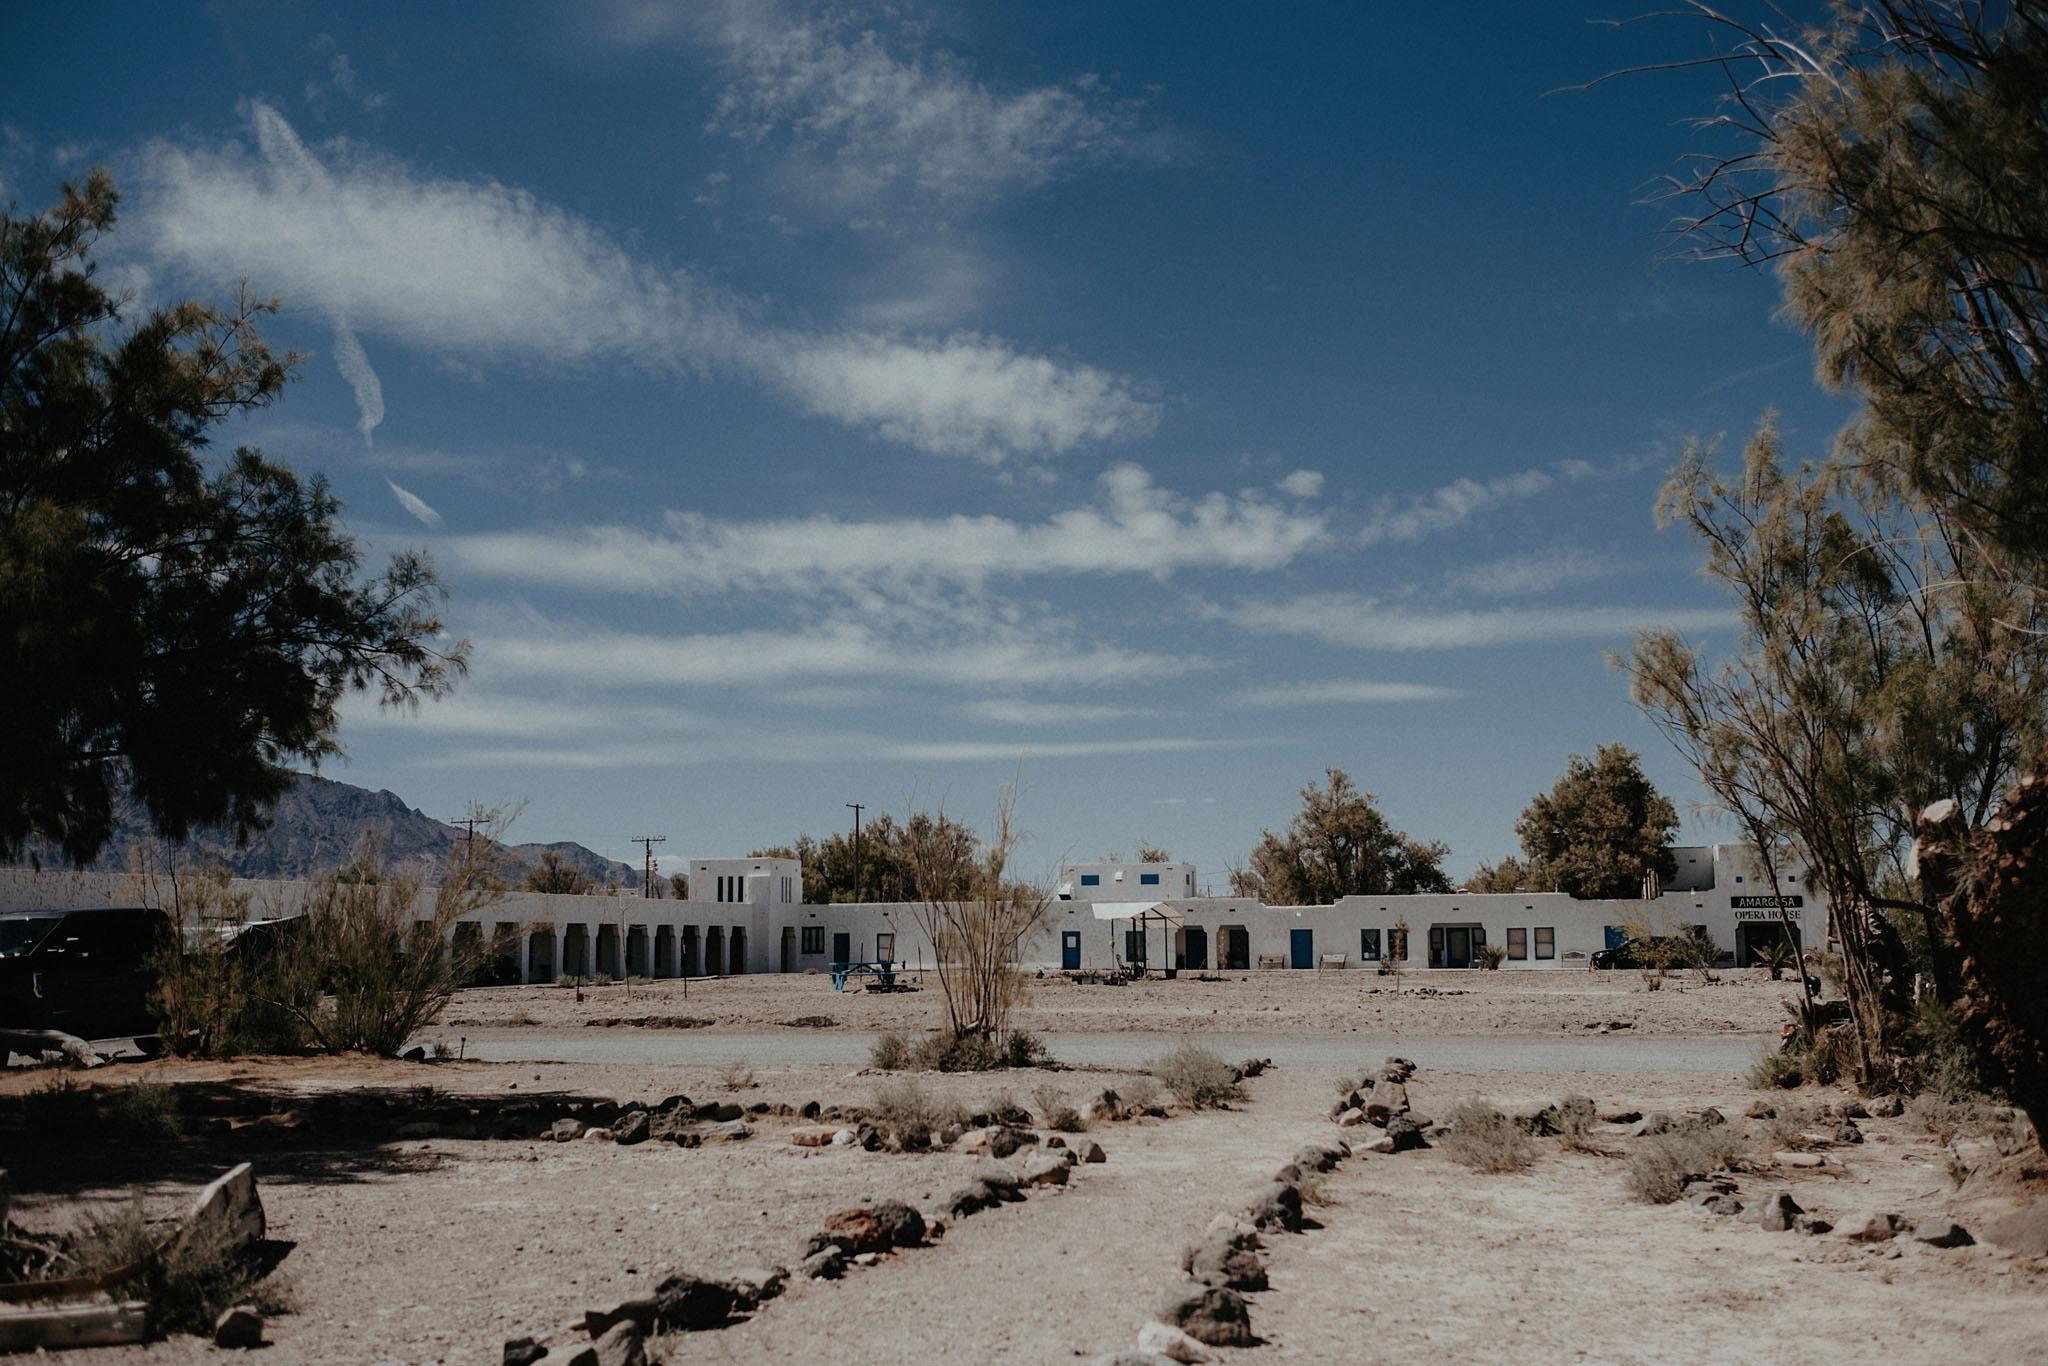 death valley adventure elopement wedding photographer national park desert